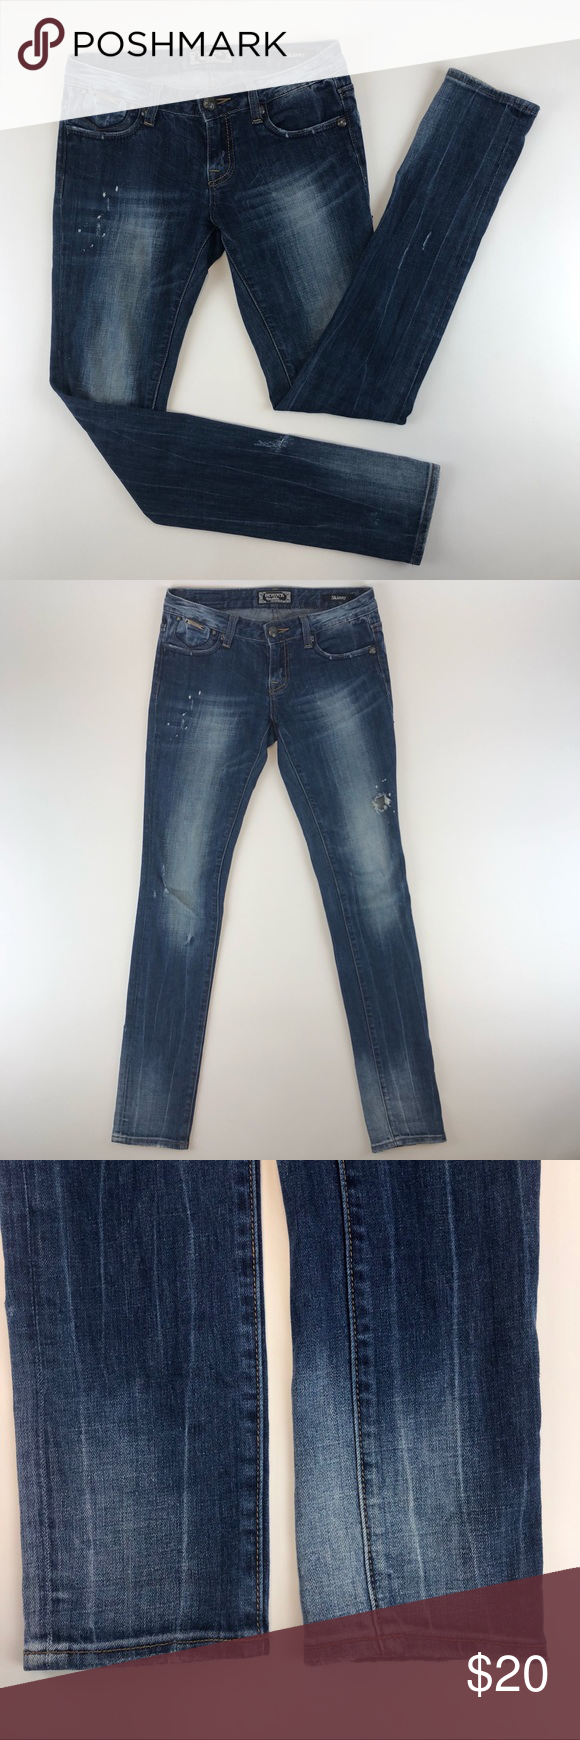 REROCK for Express Women's Distressed Skinny Jeans REROCK for